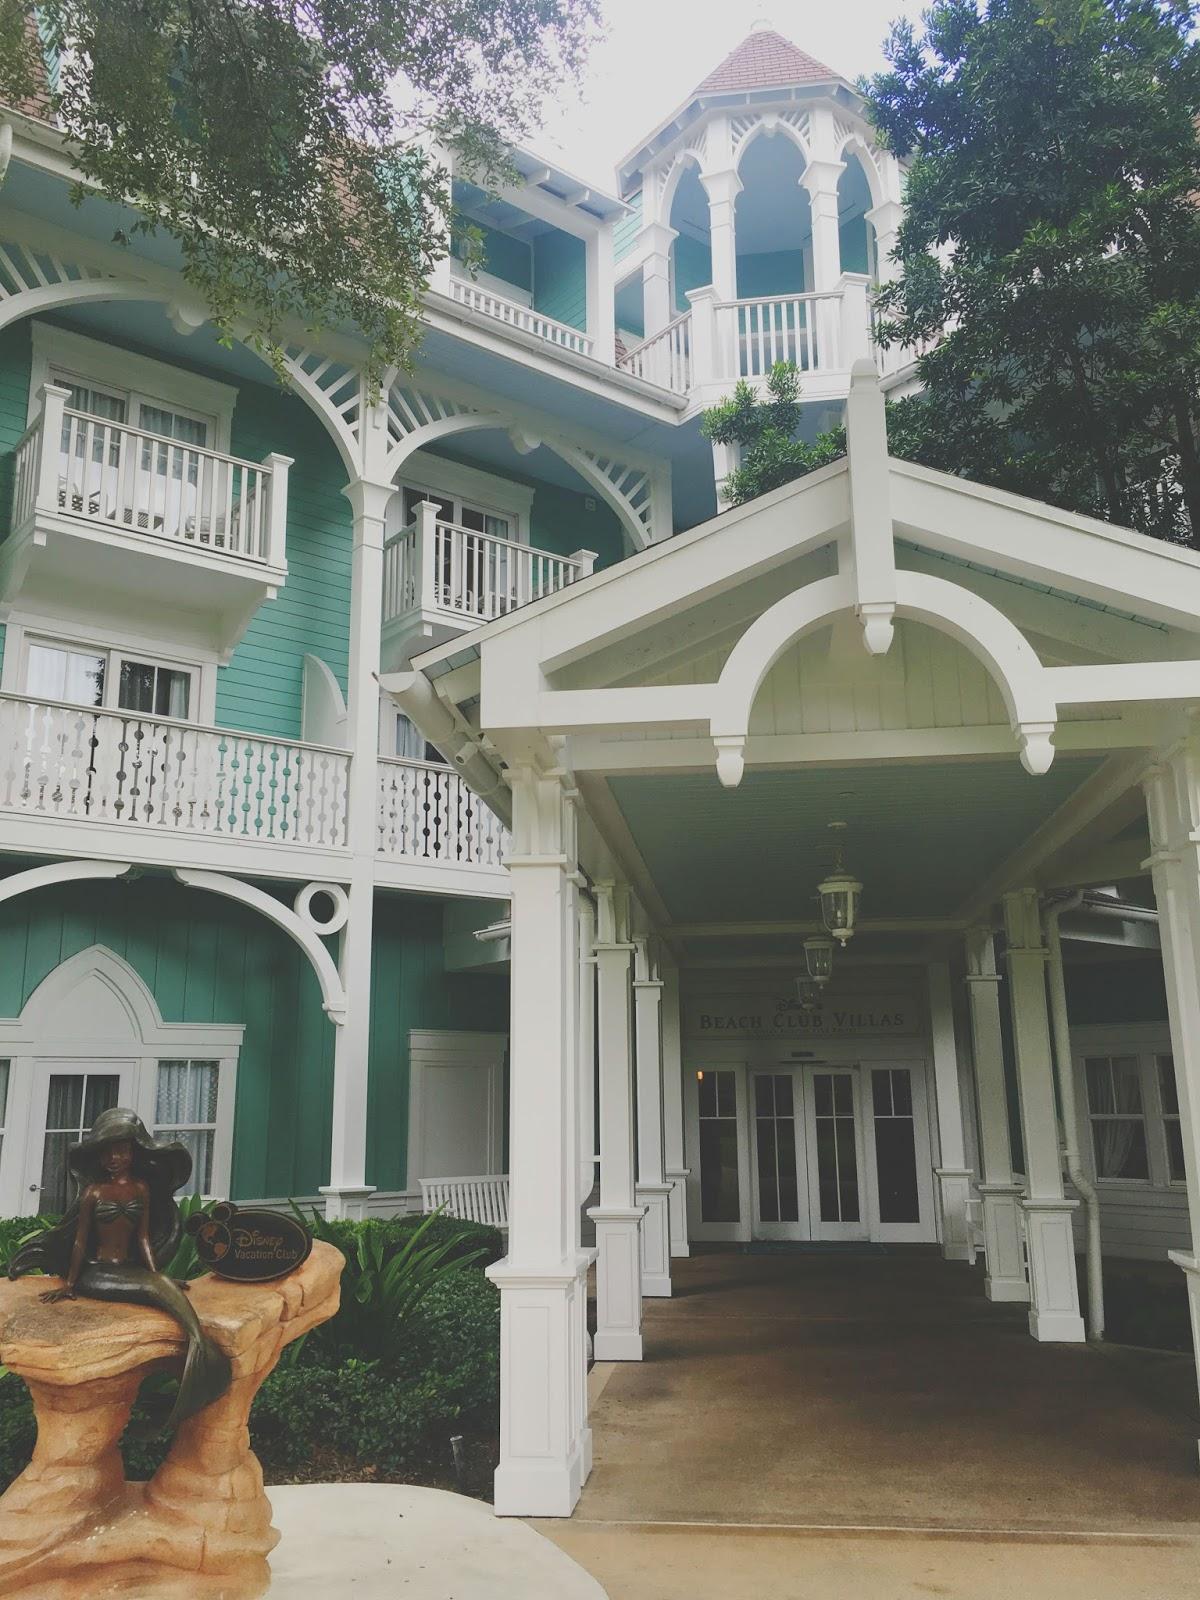 Beach Club Villas in Disney World, Florida